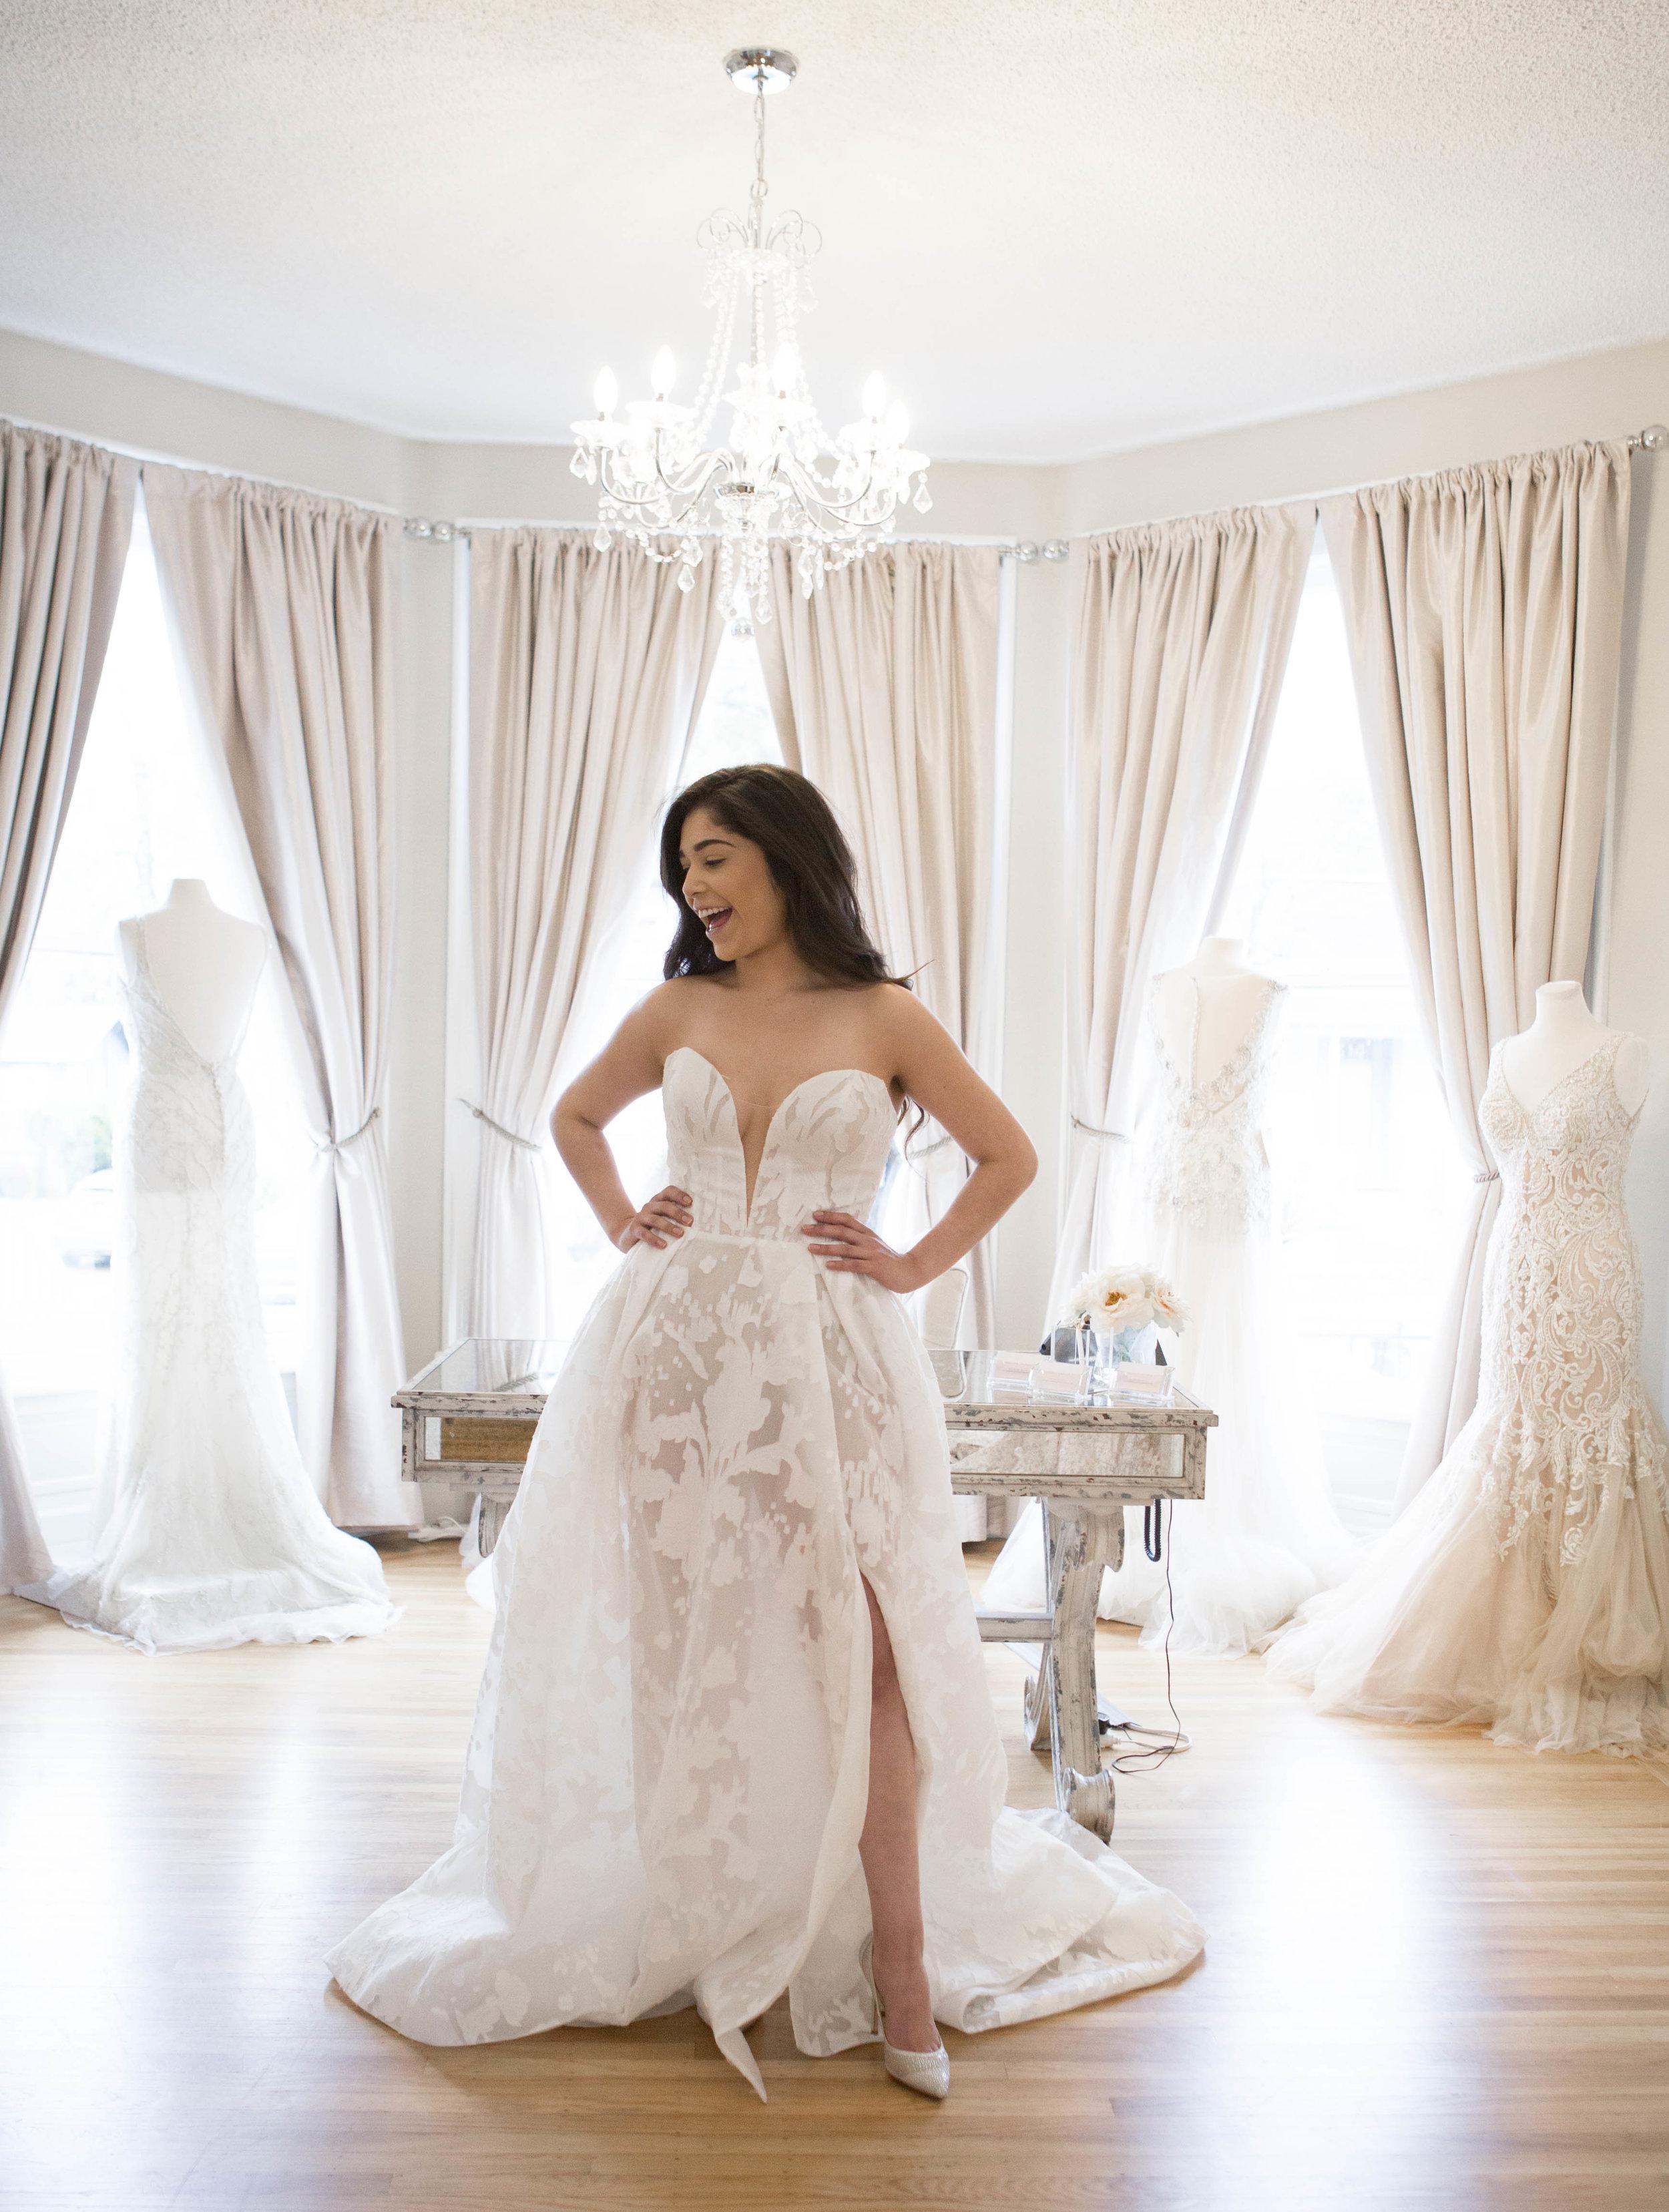 Wedding Dress Sale at Wine Country Bride Boutique | Santa Rosa